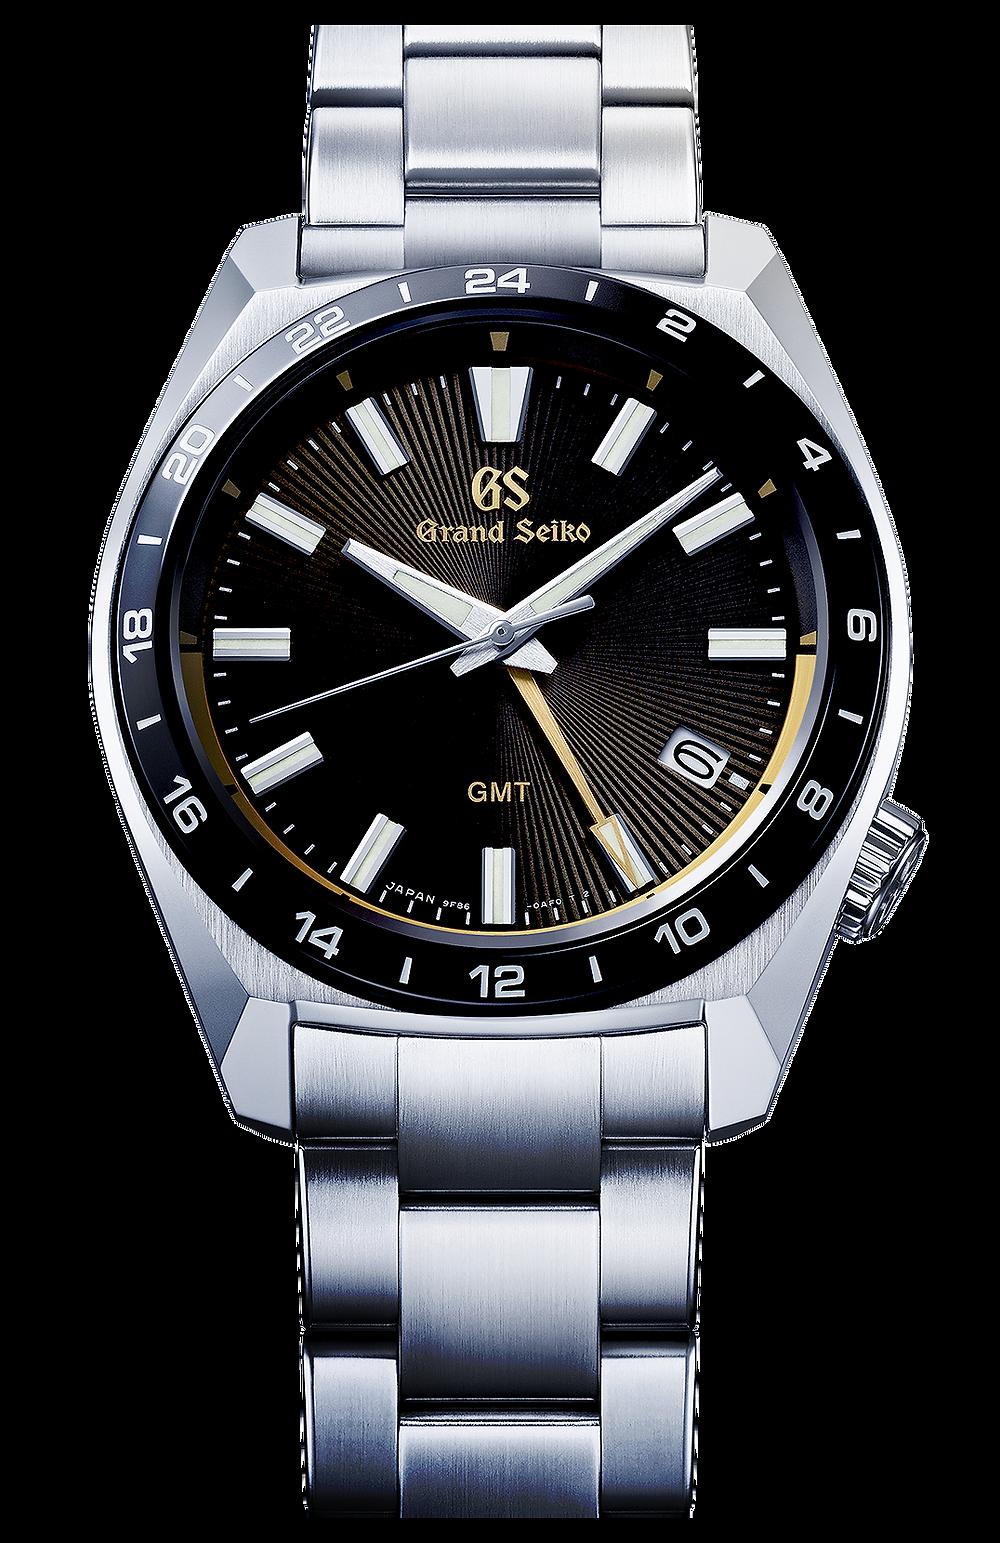 Novedad reloj alta gama Grand Seiko 140th SBGN023G